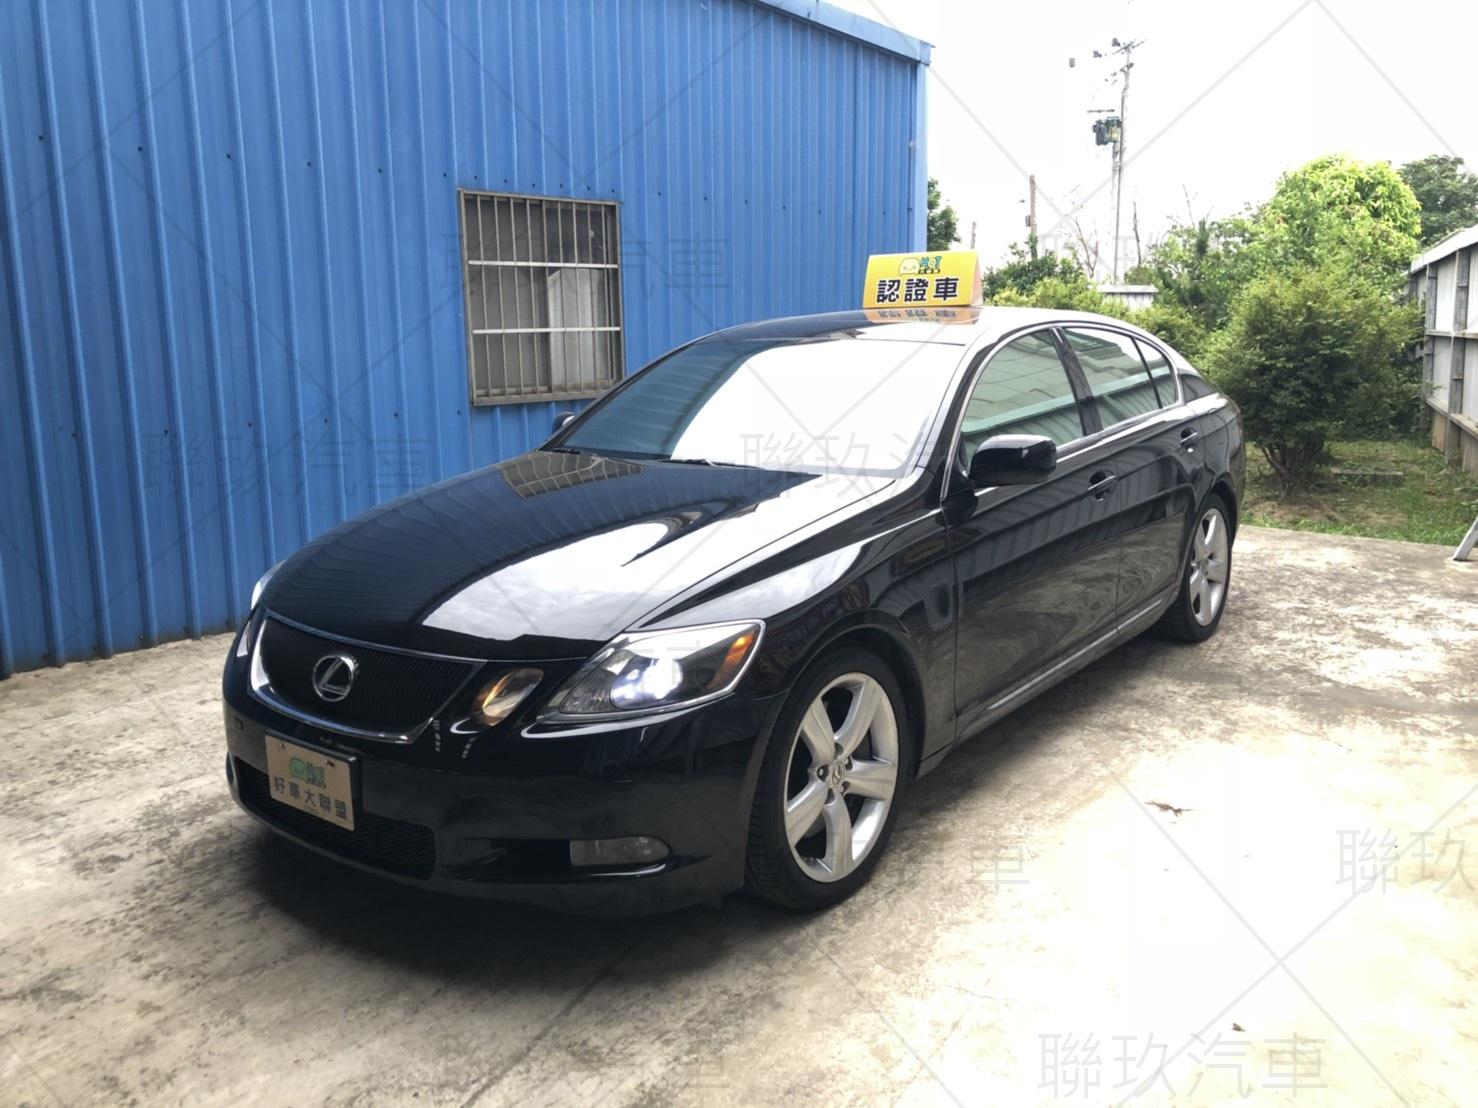 2011 Lexus 凌志 Gs